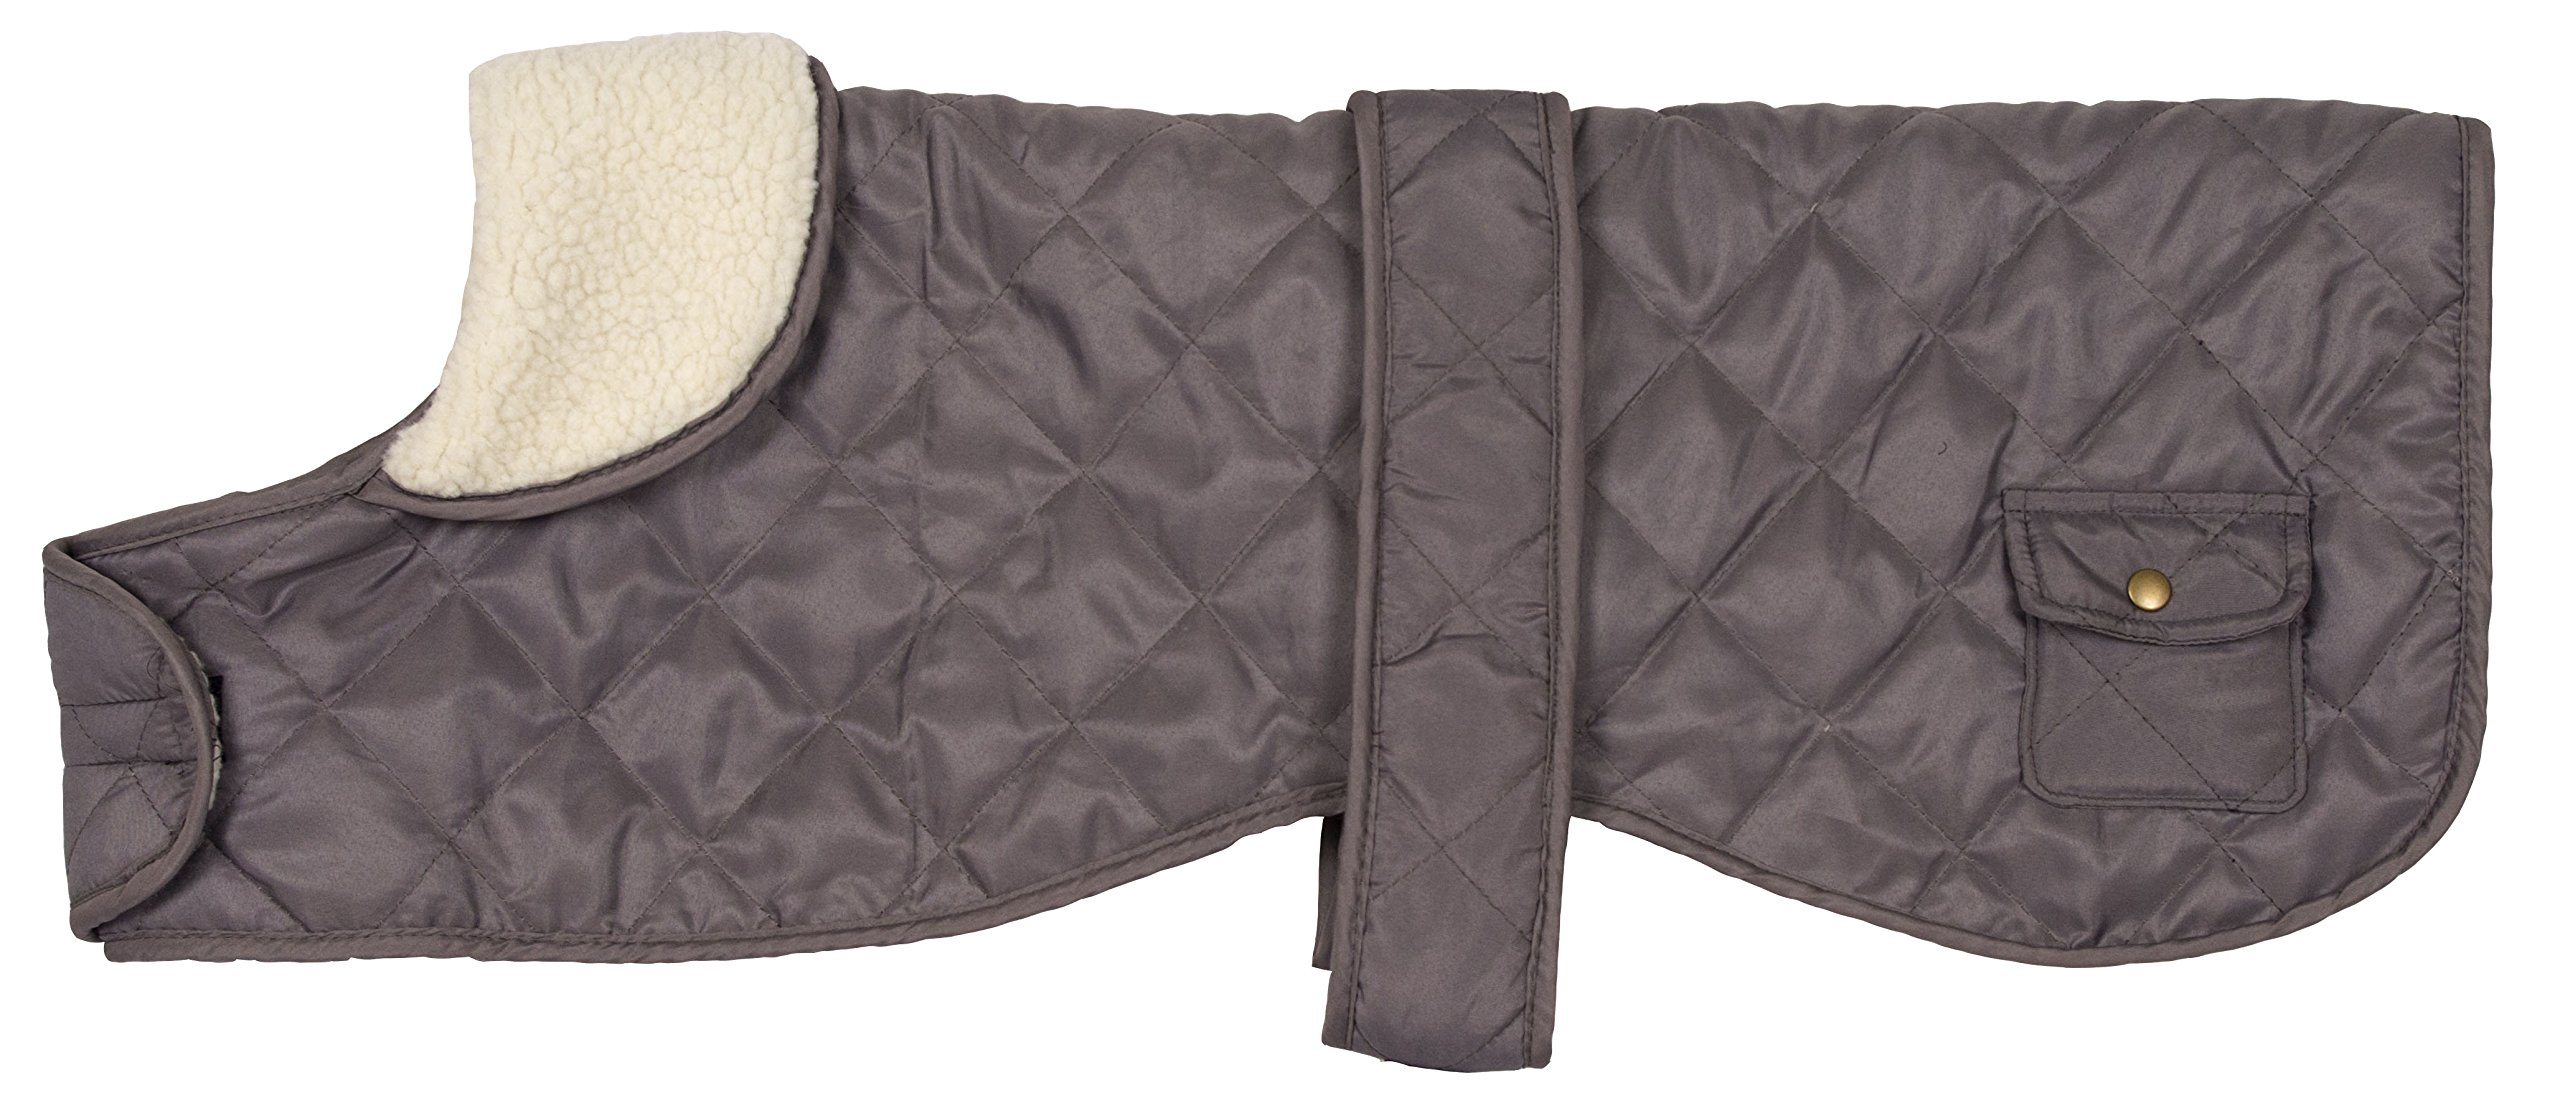 Banbury-Co-All-Weather-Comfort-Coat